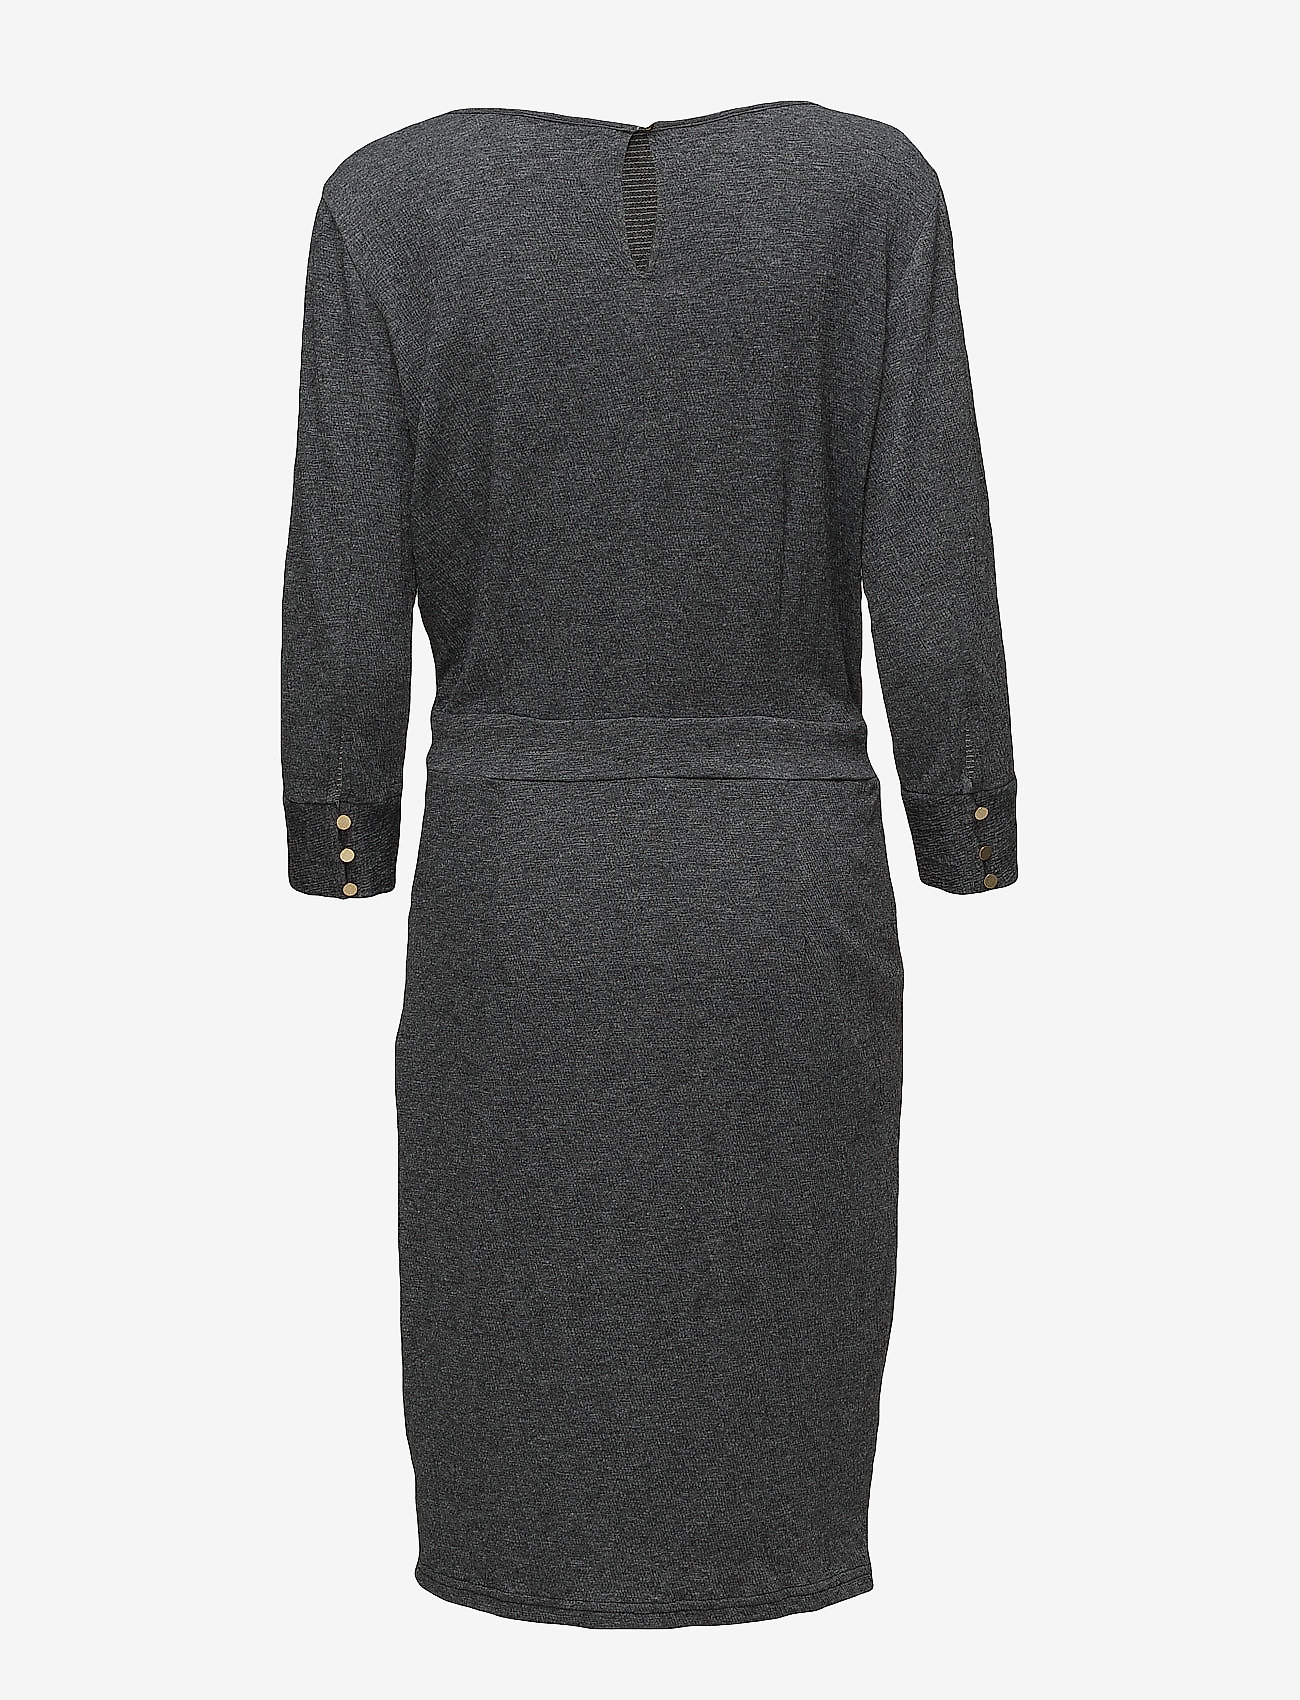 Minus Holly dress - Dresses RAVEN GREY MELANGE